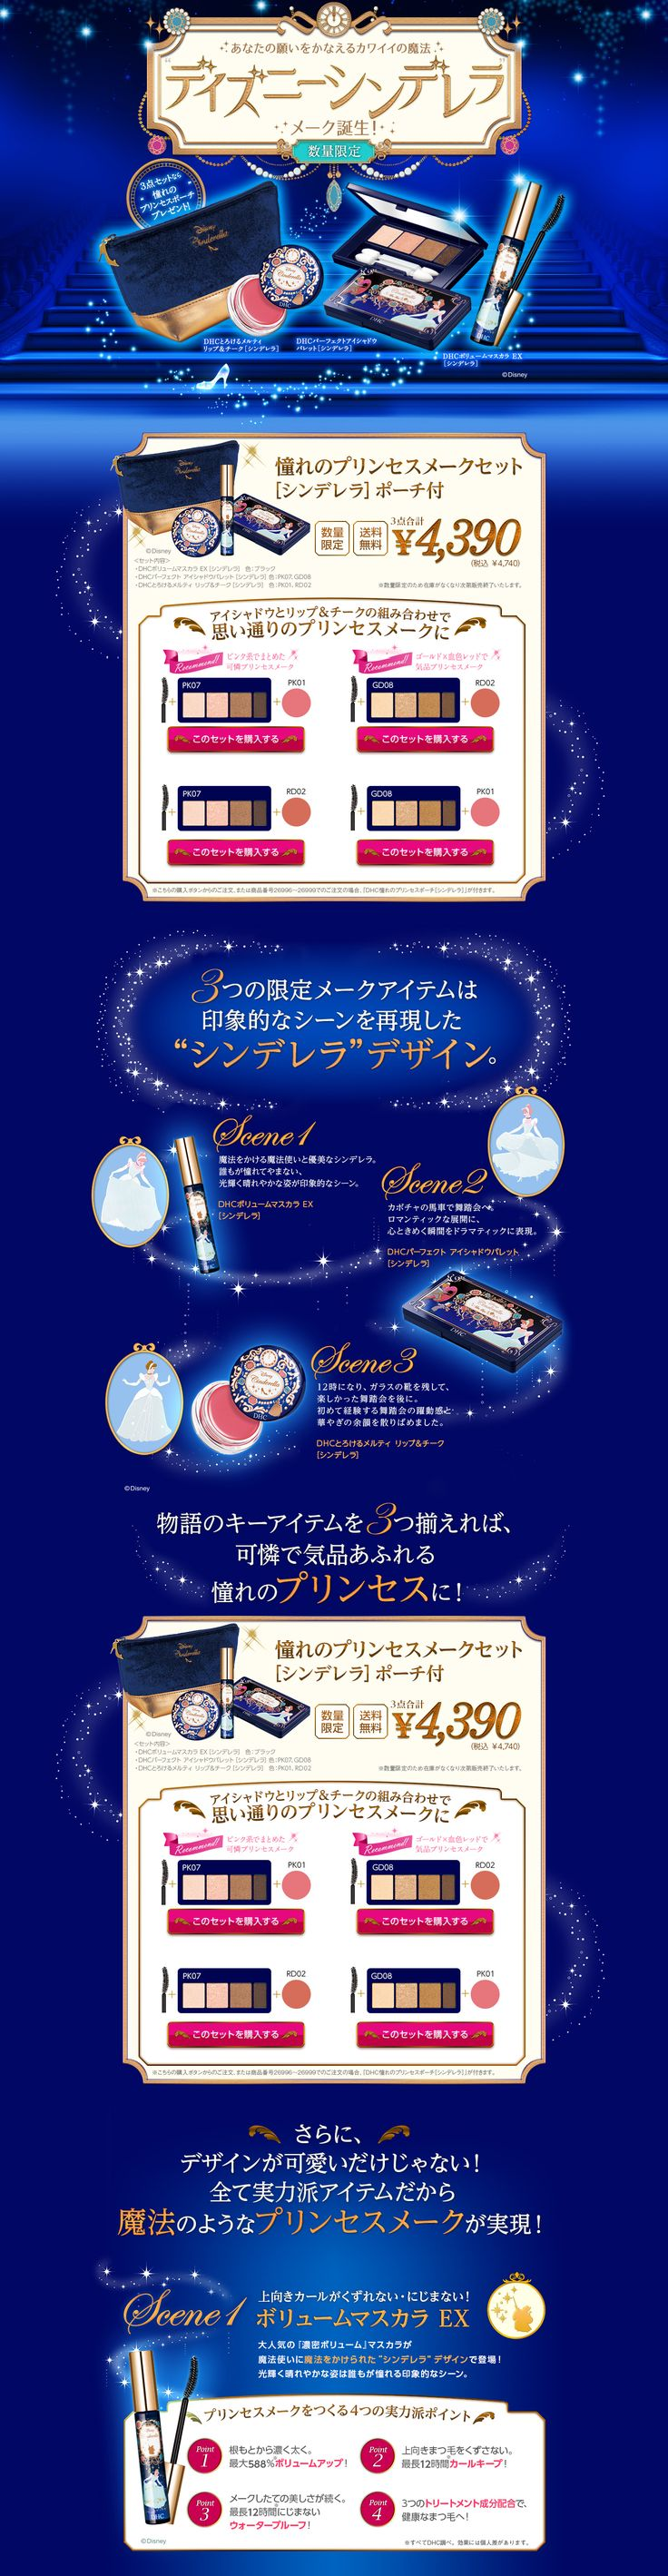 http://top.dhc.co.jp/shop/ad/disney_all/index_se7_sdlfkh.html DHC cosme…